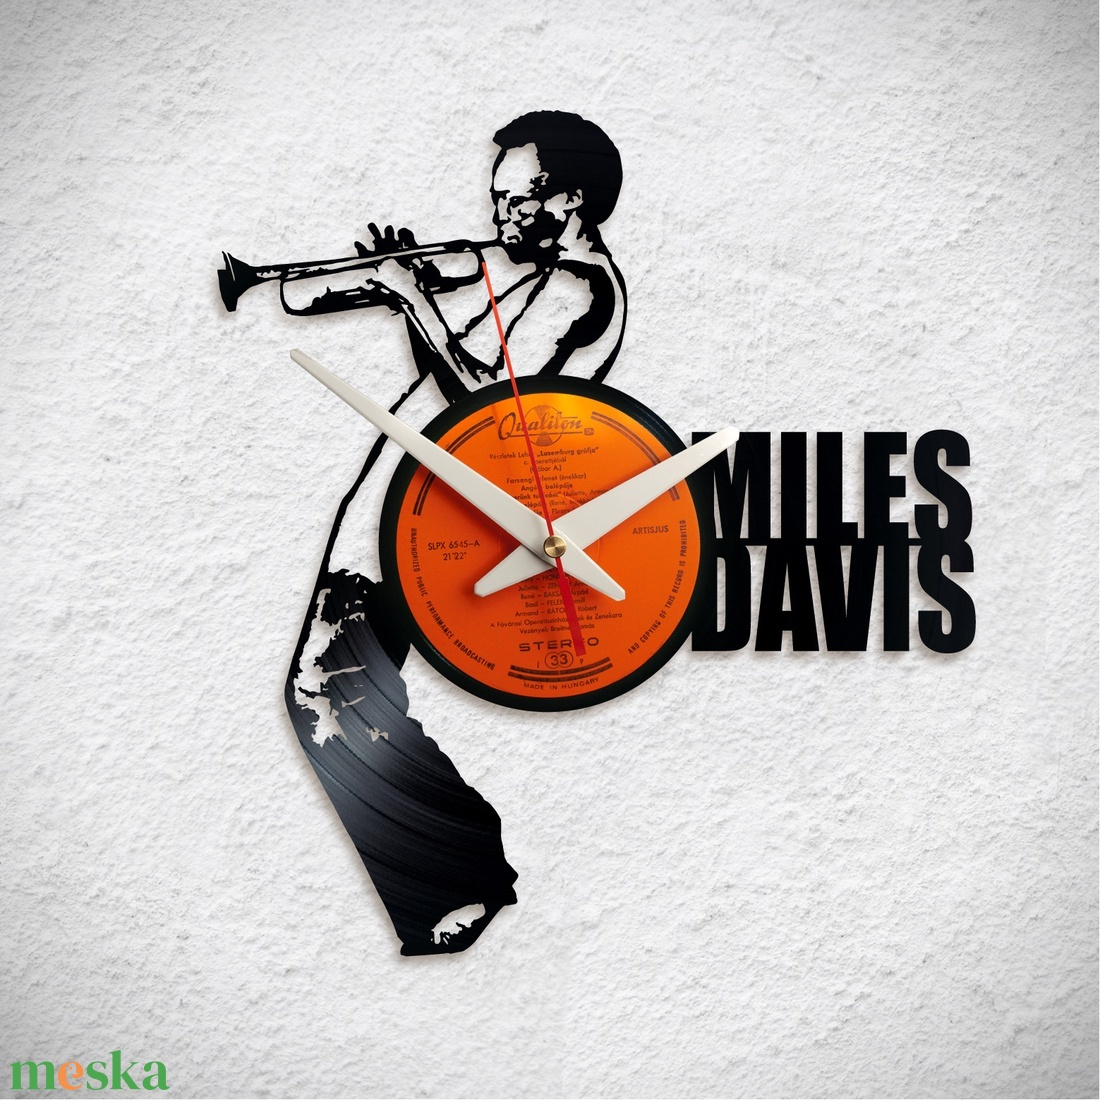 Miles Davis - Jazz - Bakelit falióra - Meska.hu